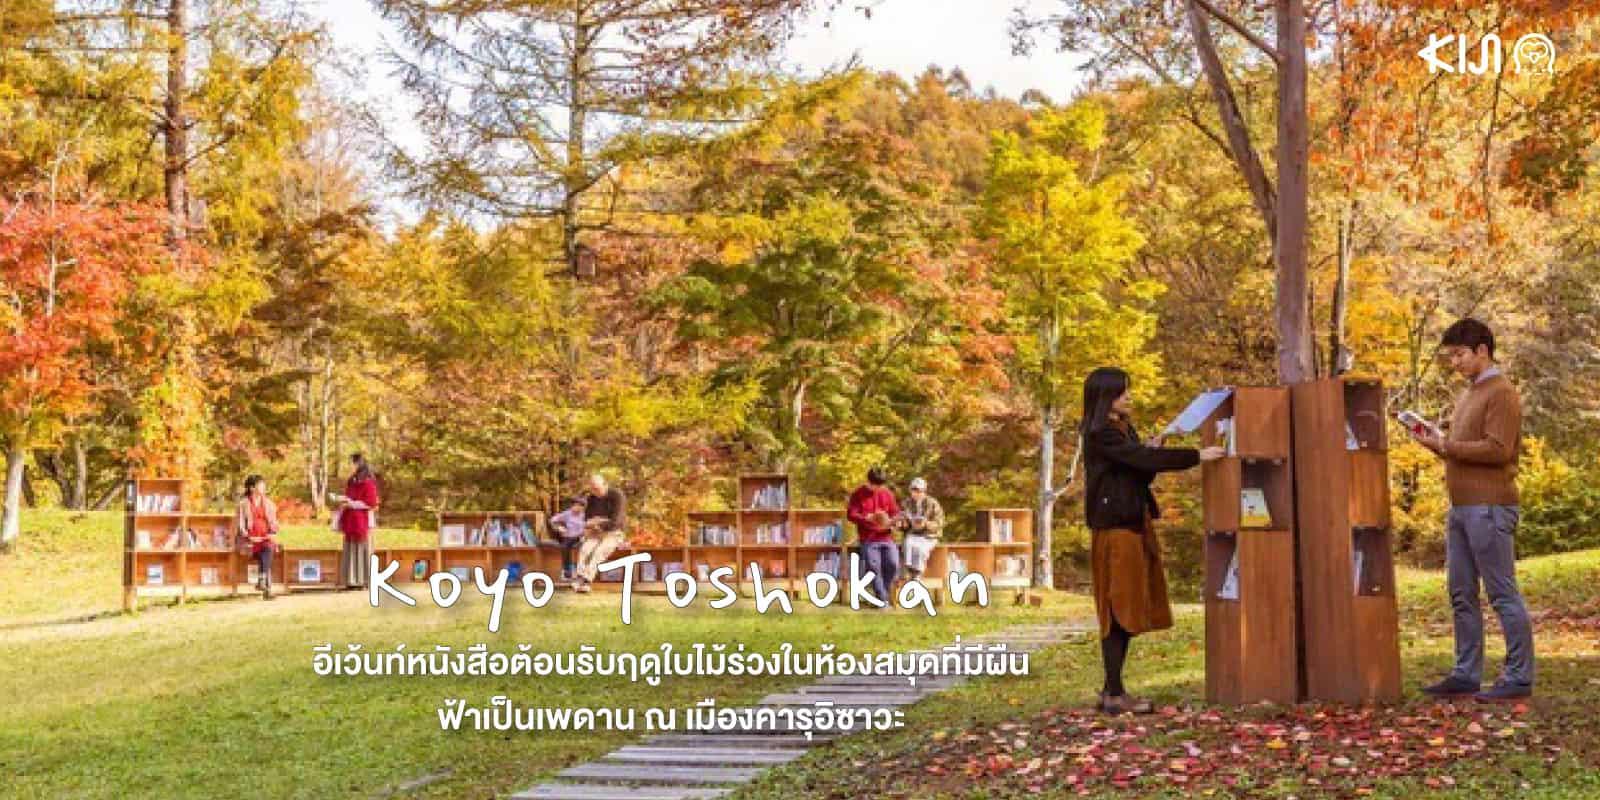 Koyo Toshokan อีเว้นท์ ฤดูใบไม้ร่วง คารุอิซาวะ (Karuizawa) จ.นากาโน่ (Nagano)